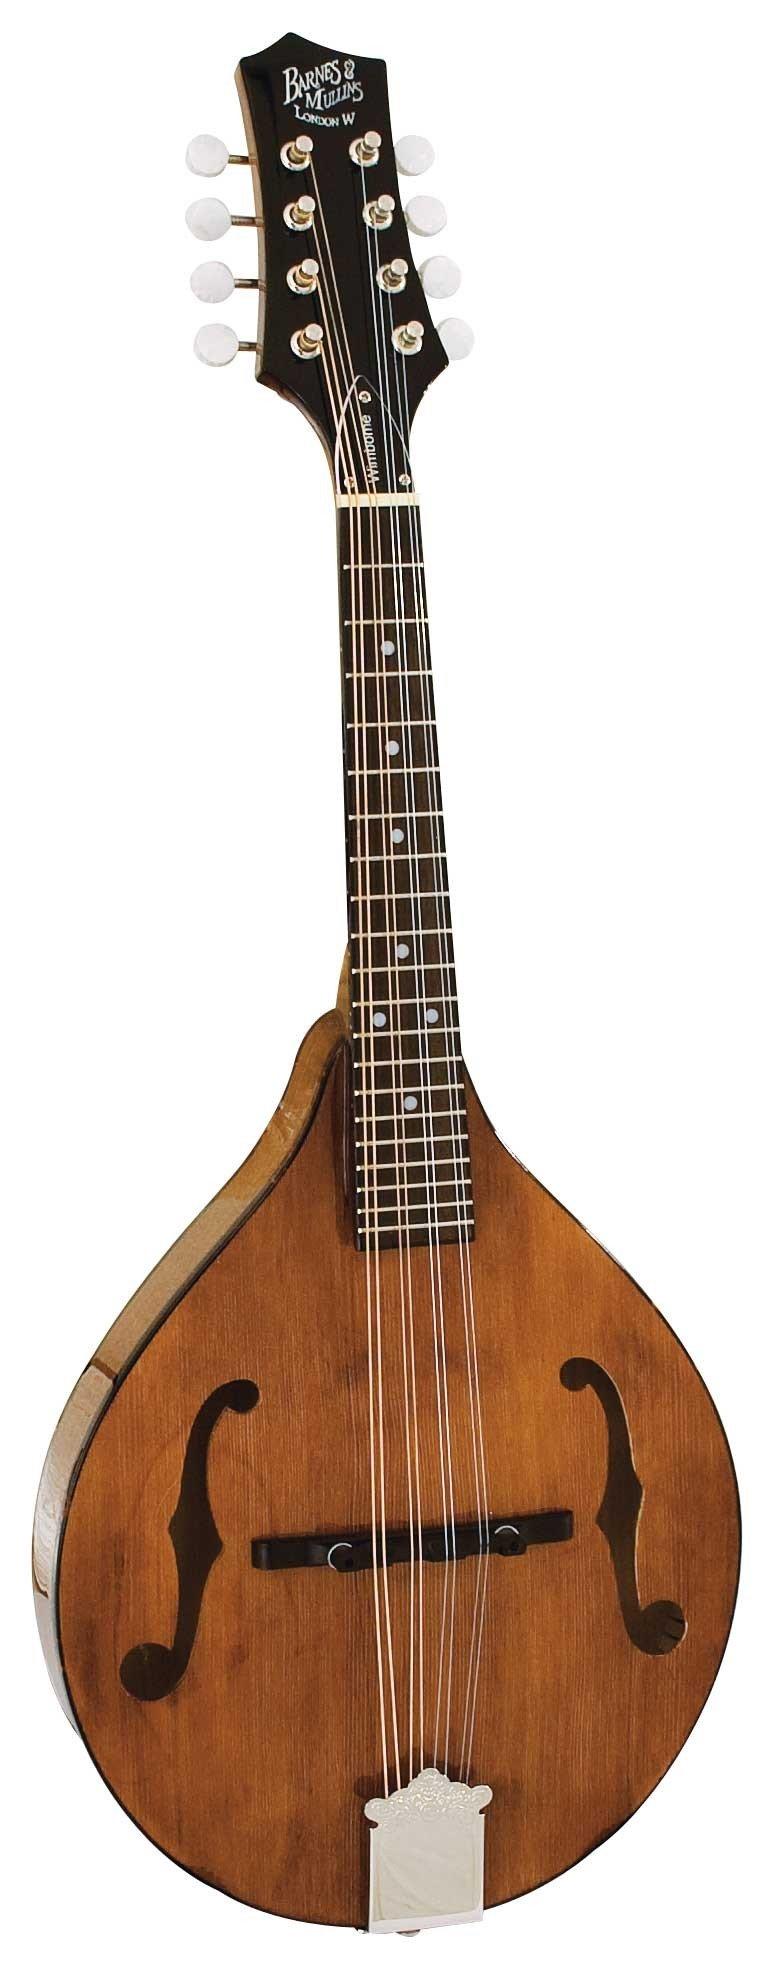 Barnes and Mullins Mandolin - Wimborne Model Electro